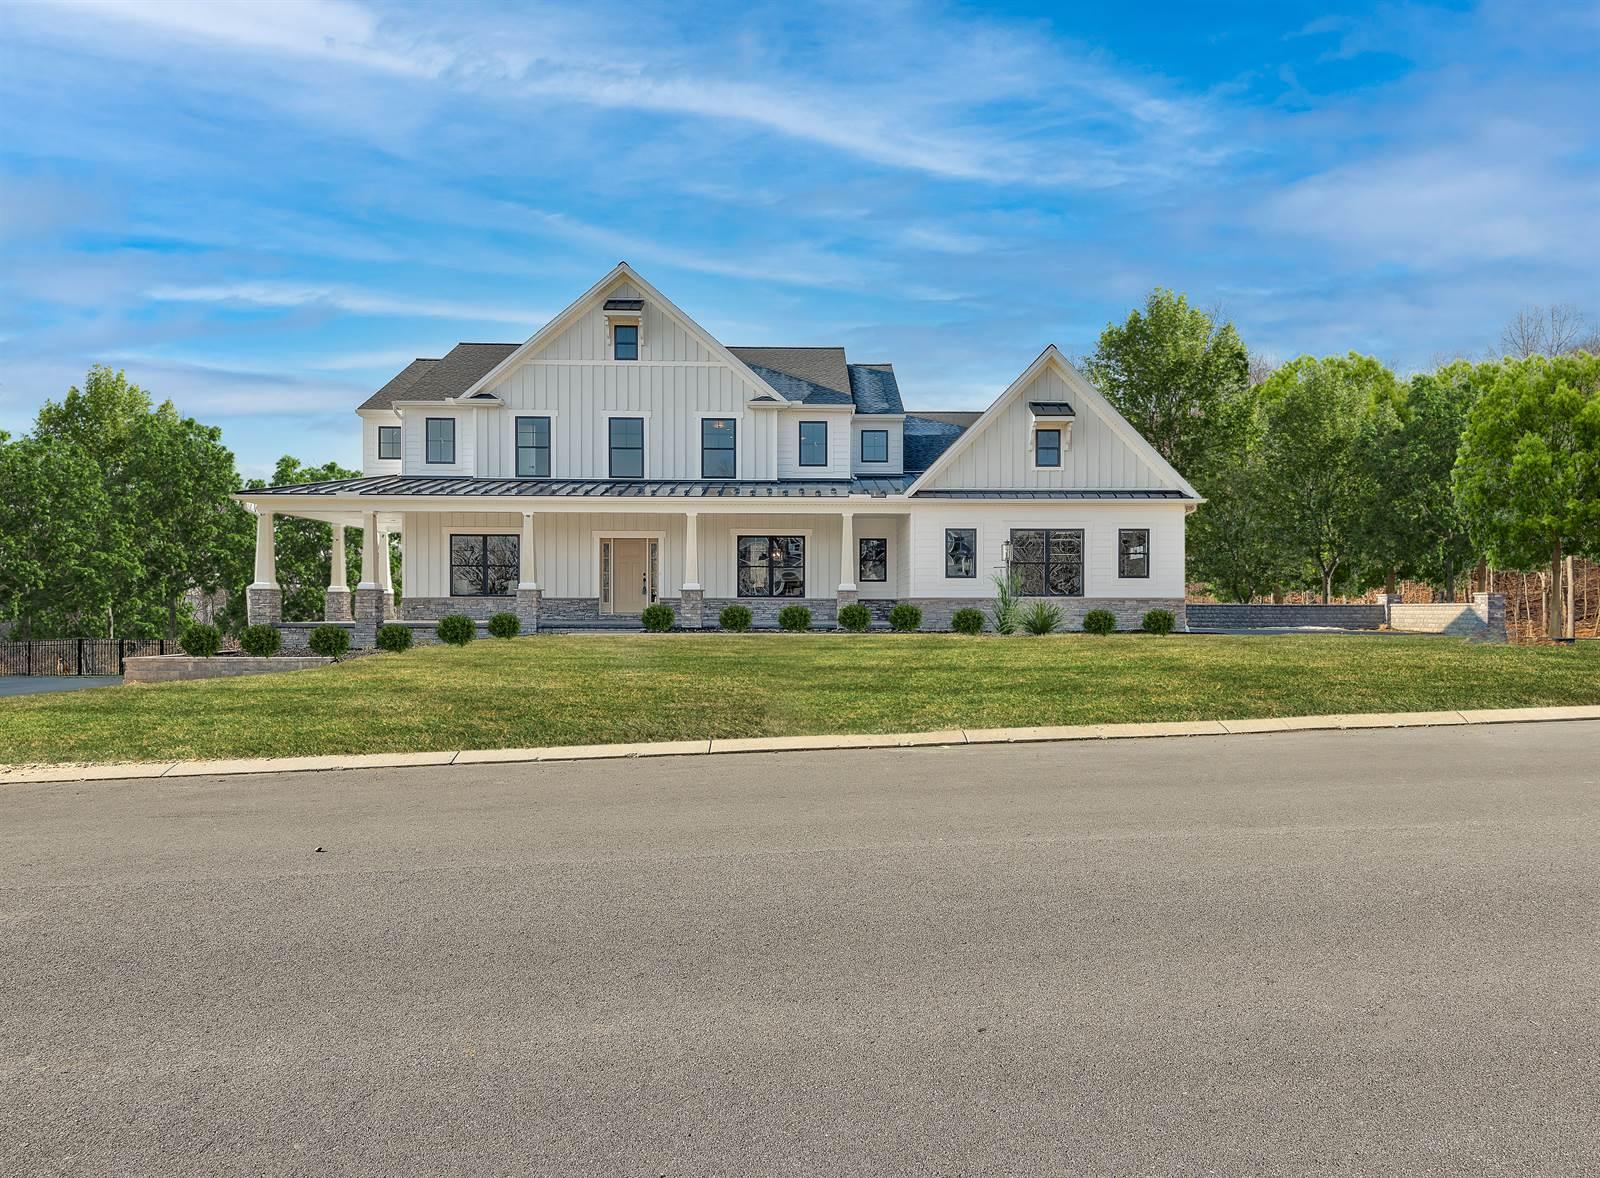 Lot 54 Royal Ave, Harrisburg, PA 17112